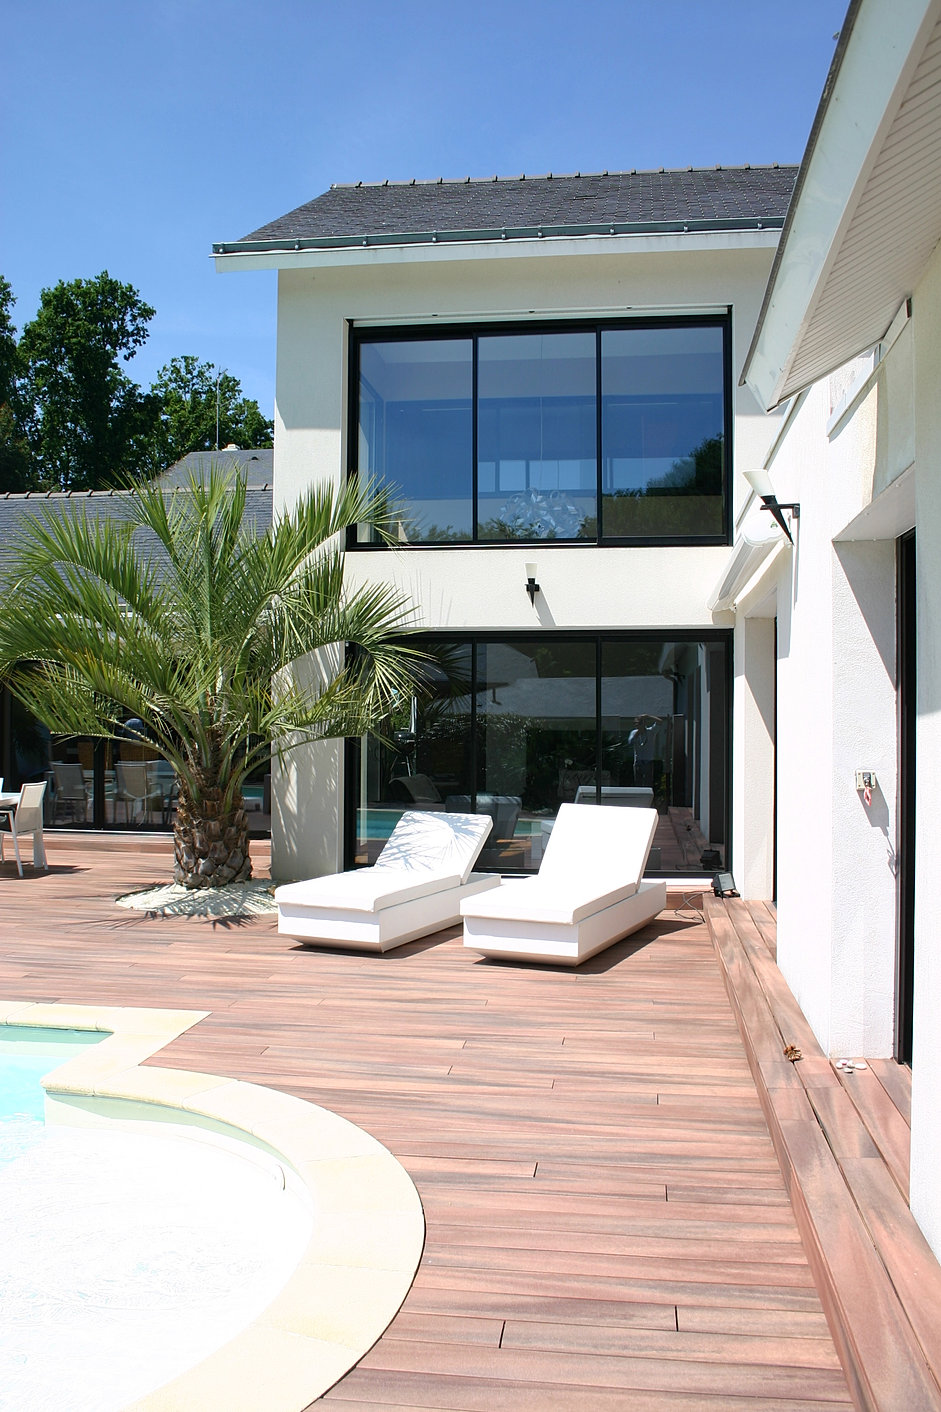 Prix maison neuve 200m2 maison 150 m ensemu2026 maison 4 for Prix du m2 maison neuve